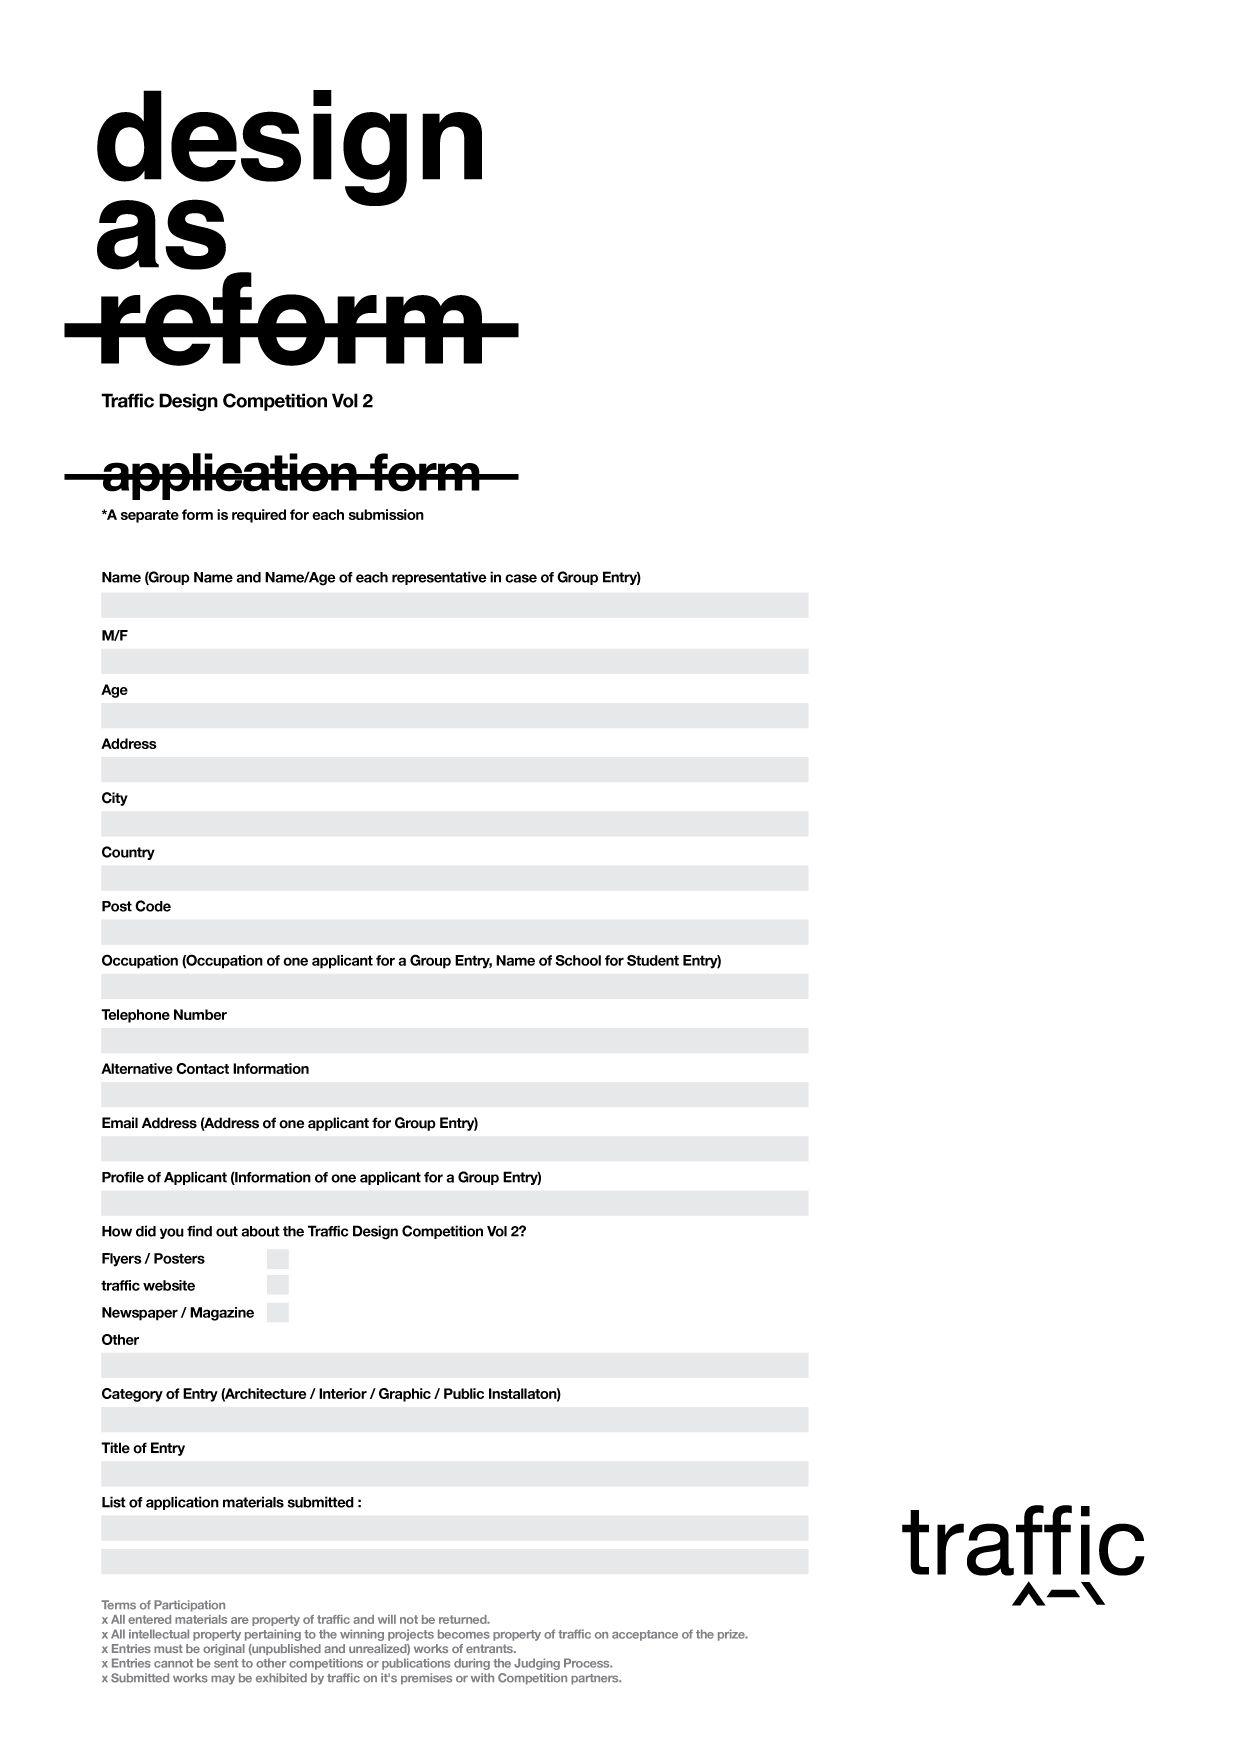 Traffic Design Petition Vol Reform | Forms | Pinterest